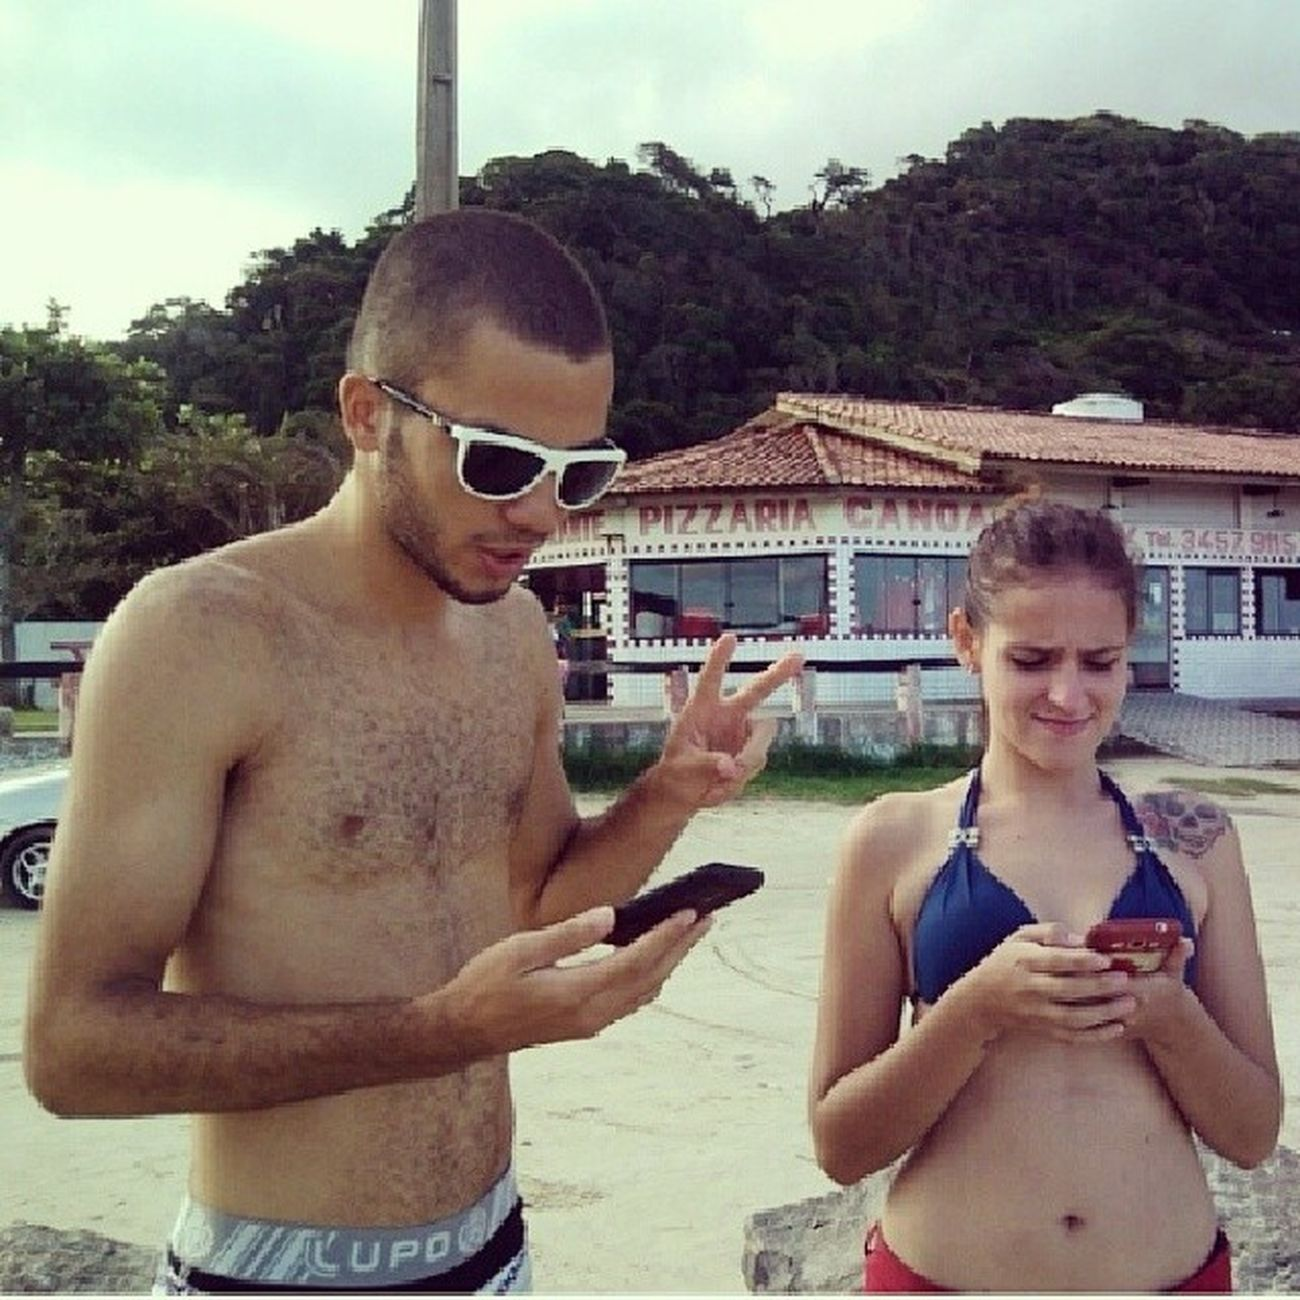 Pausa para internetá hehe Atualizando Instapraia InstaSol Instagram facebook whatsapp todasessastecnologias